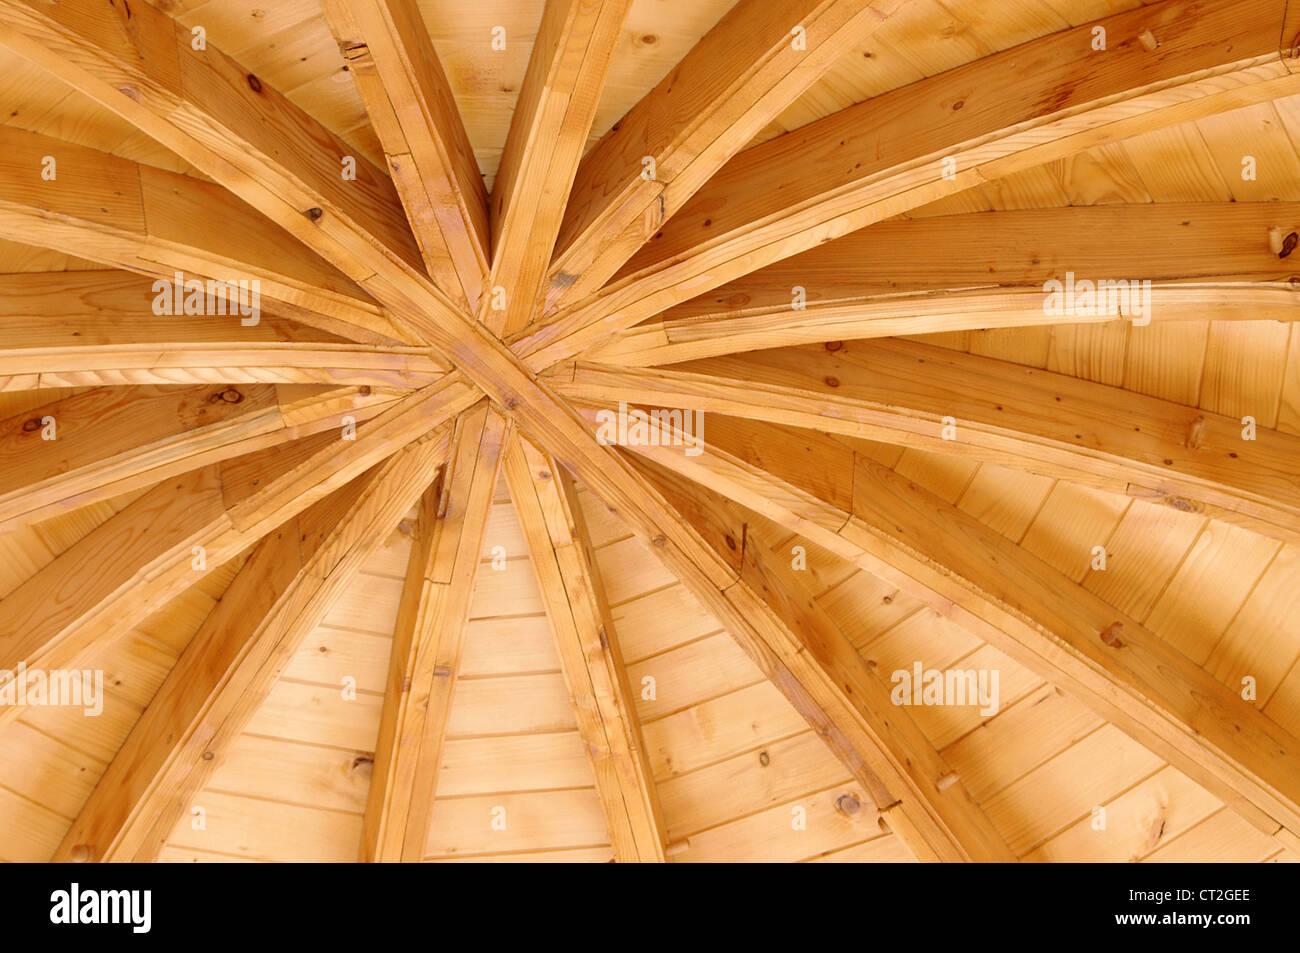 Techo de madera de una iglesia tradicional en Moldavia, Rumania Imagen De Stock